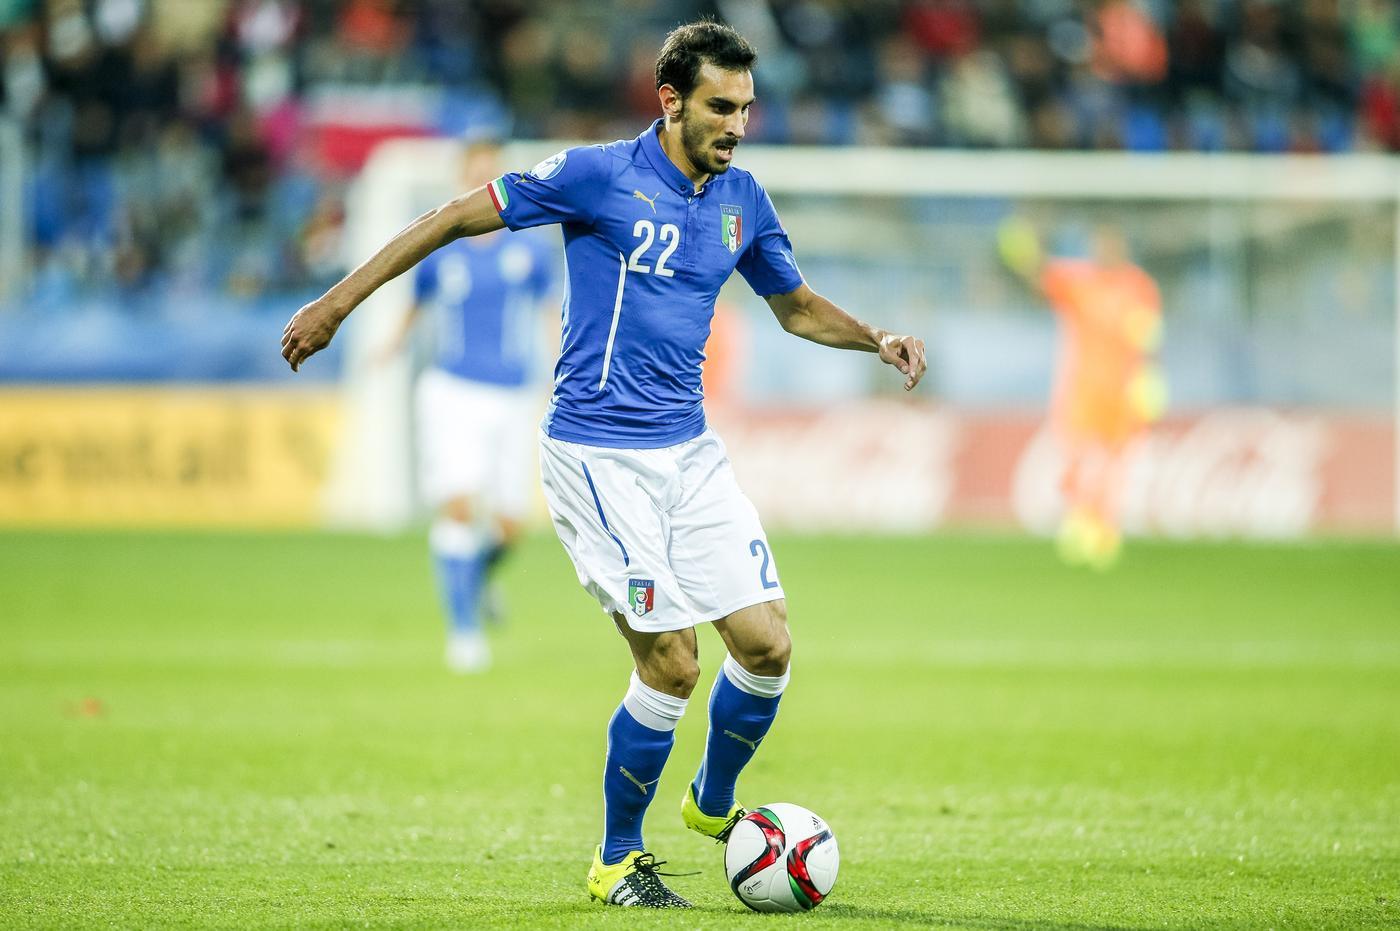 Liverpool 'plotting transfer move for Atalanta and Italy Under-21 defender Davide Zappacosta'